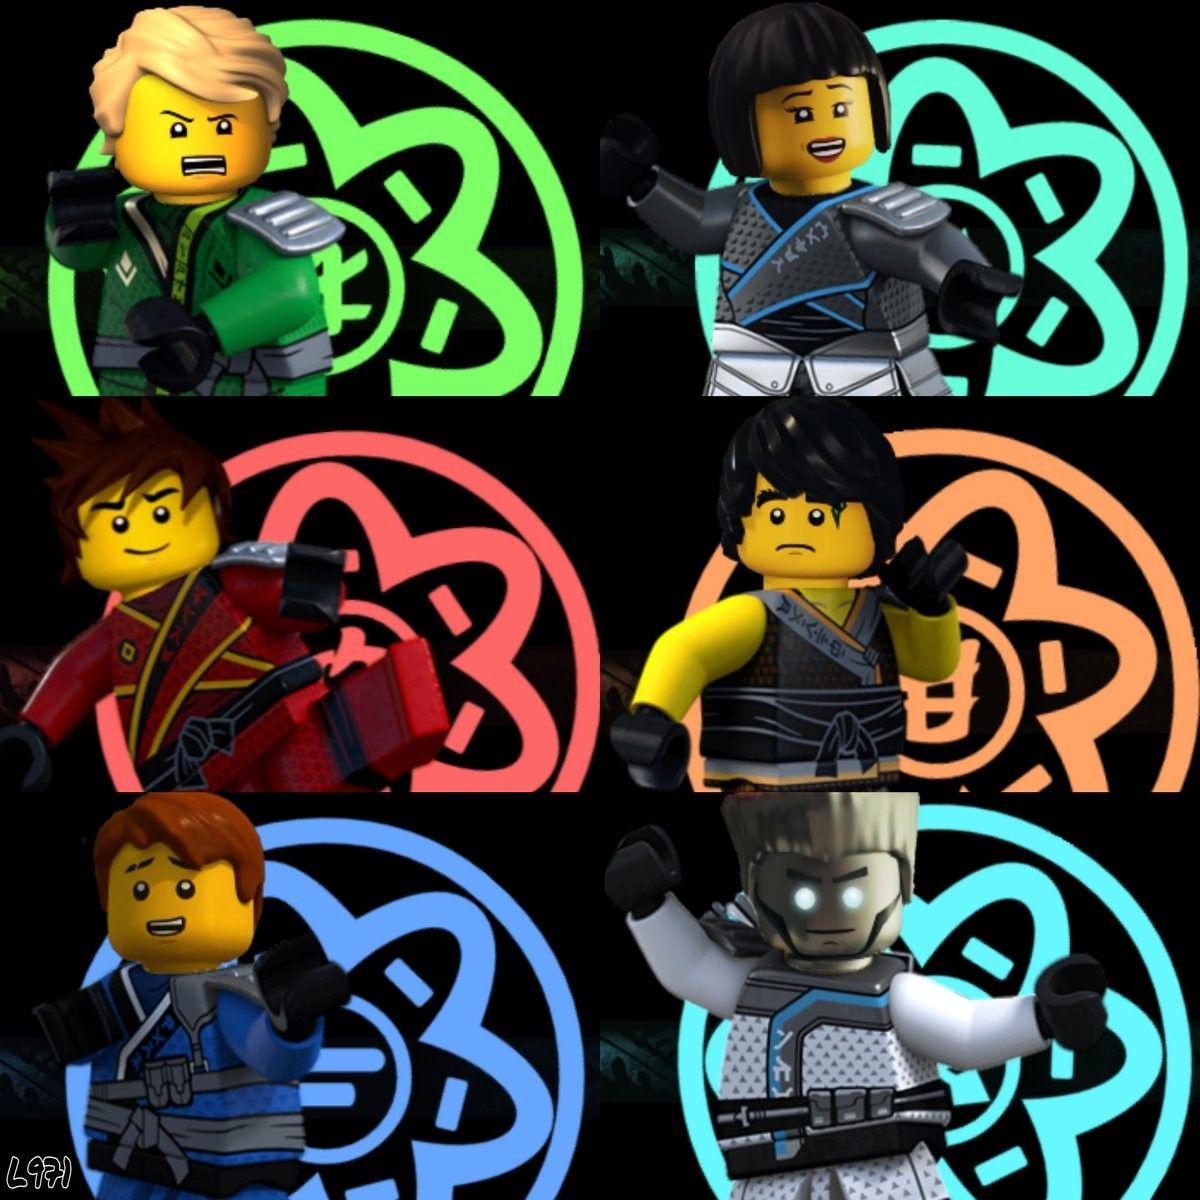 Pin By Dominika Marganska On 8 Ninjago In 2020 Lego Ninjago Movie Lego Ninjago Ninjago